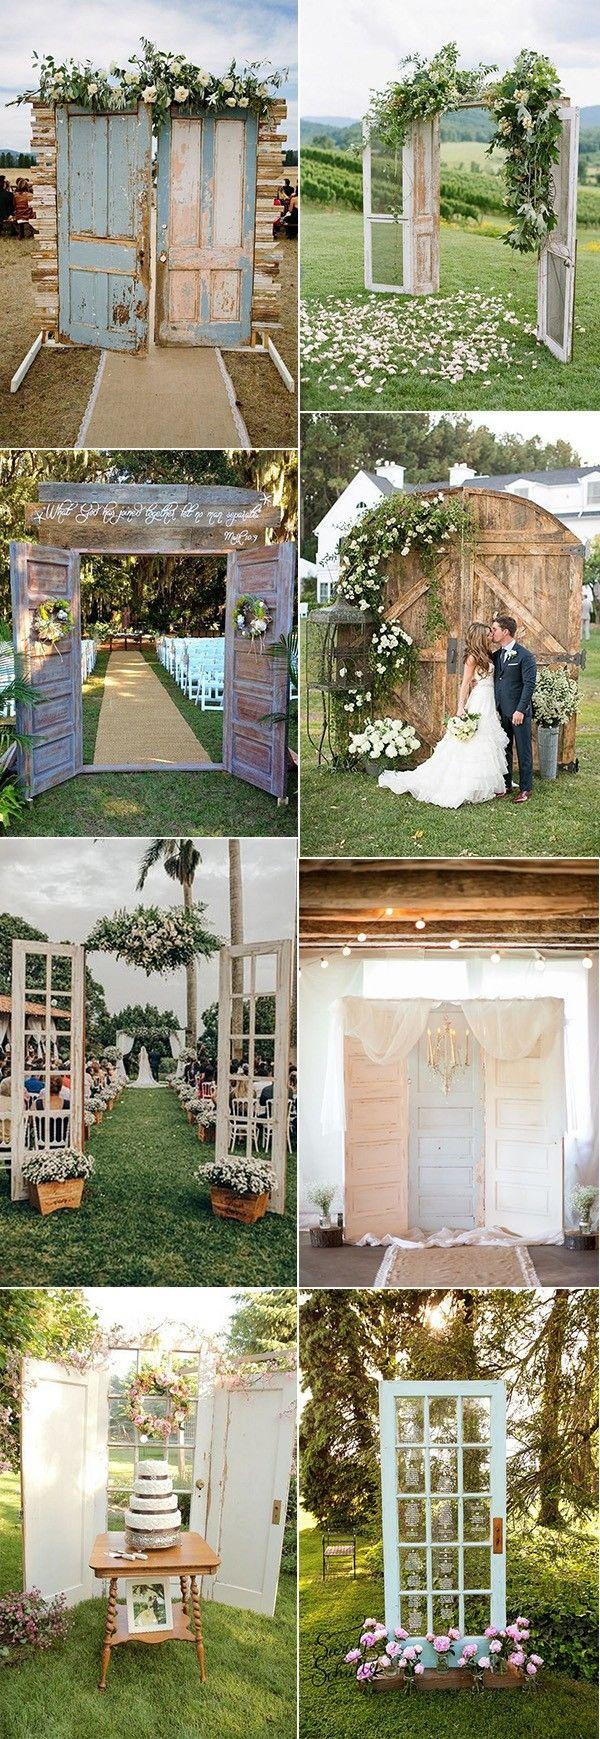 20 Rustic Wedding Decoration Ideas with Vintage Doors